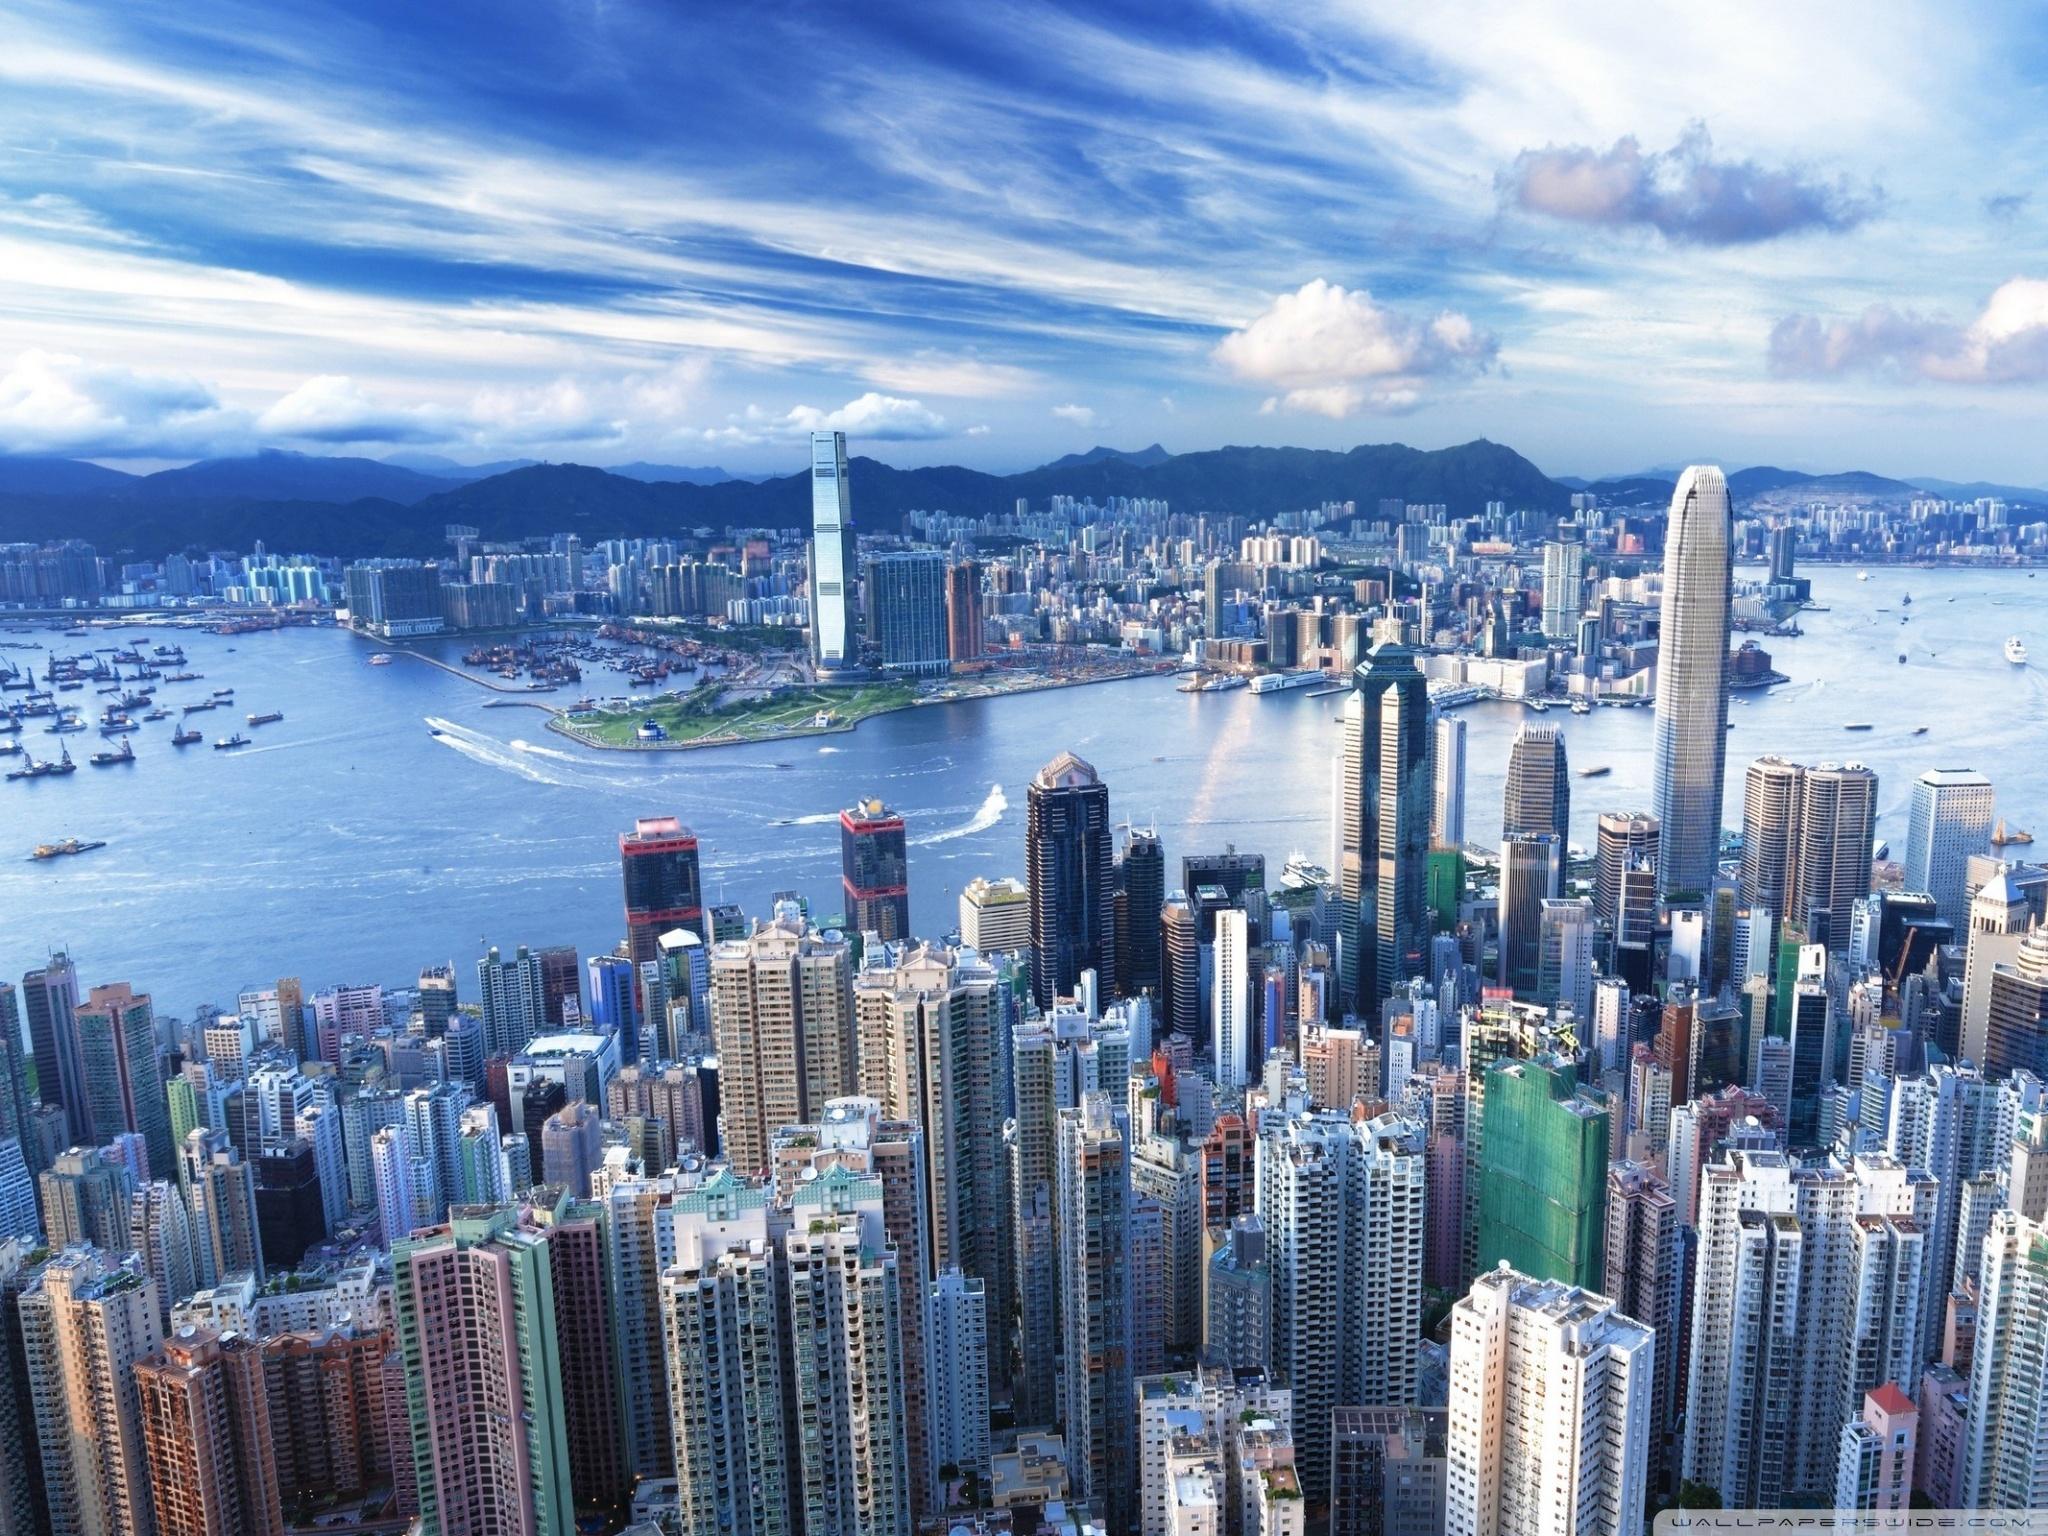 city_skyscrapers-wallpaper-2048x1536